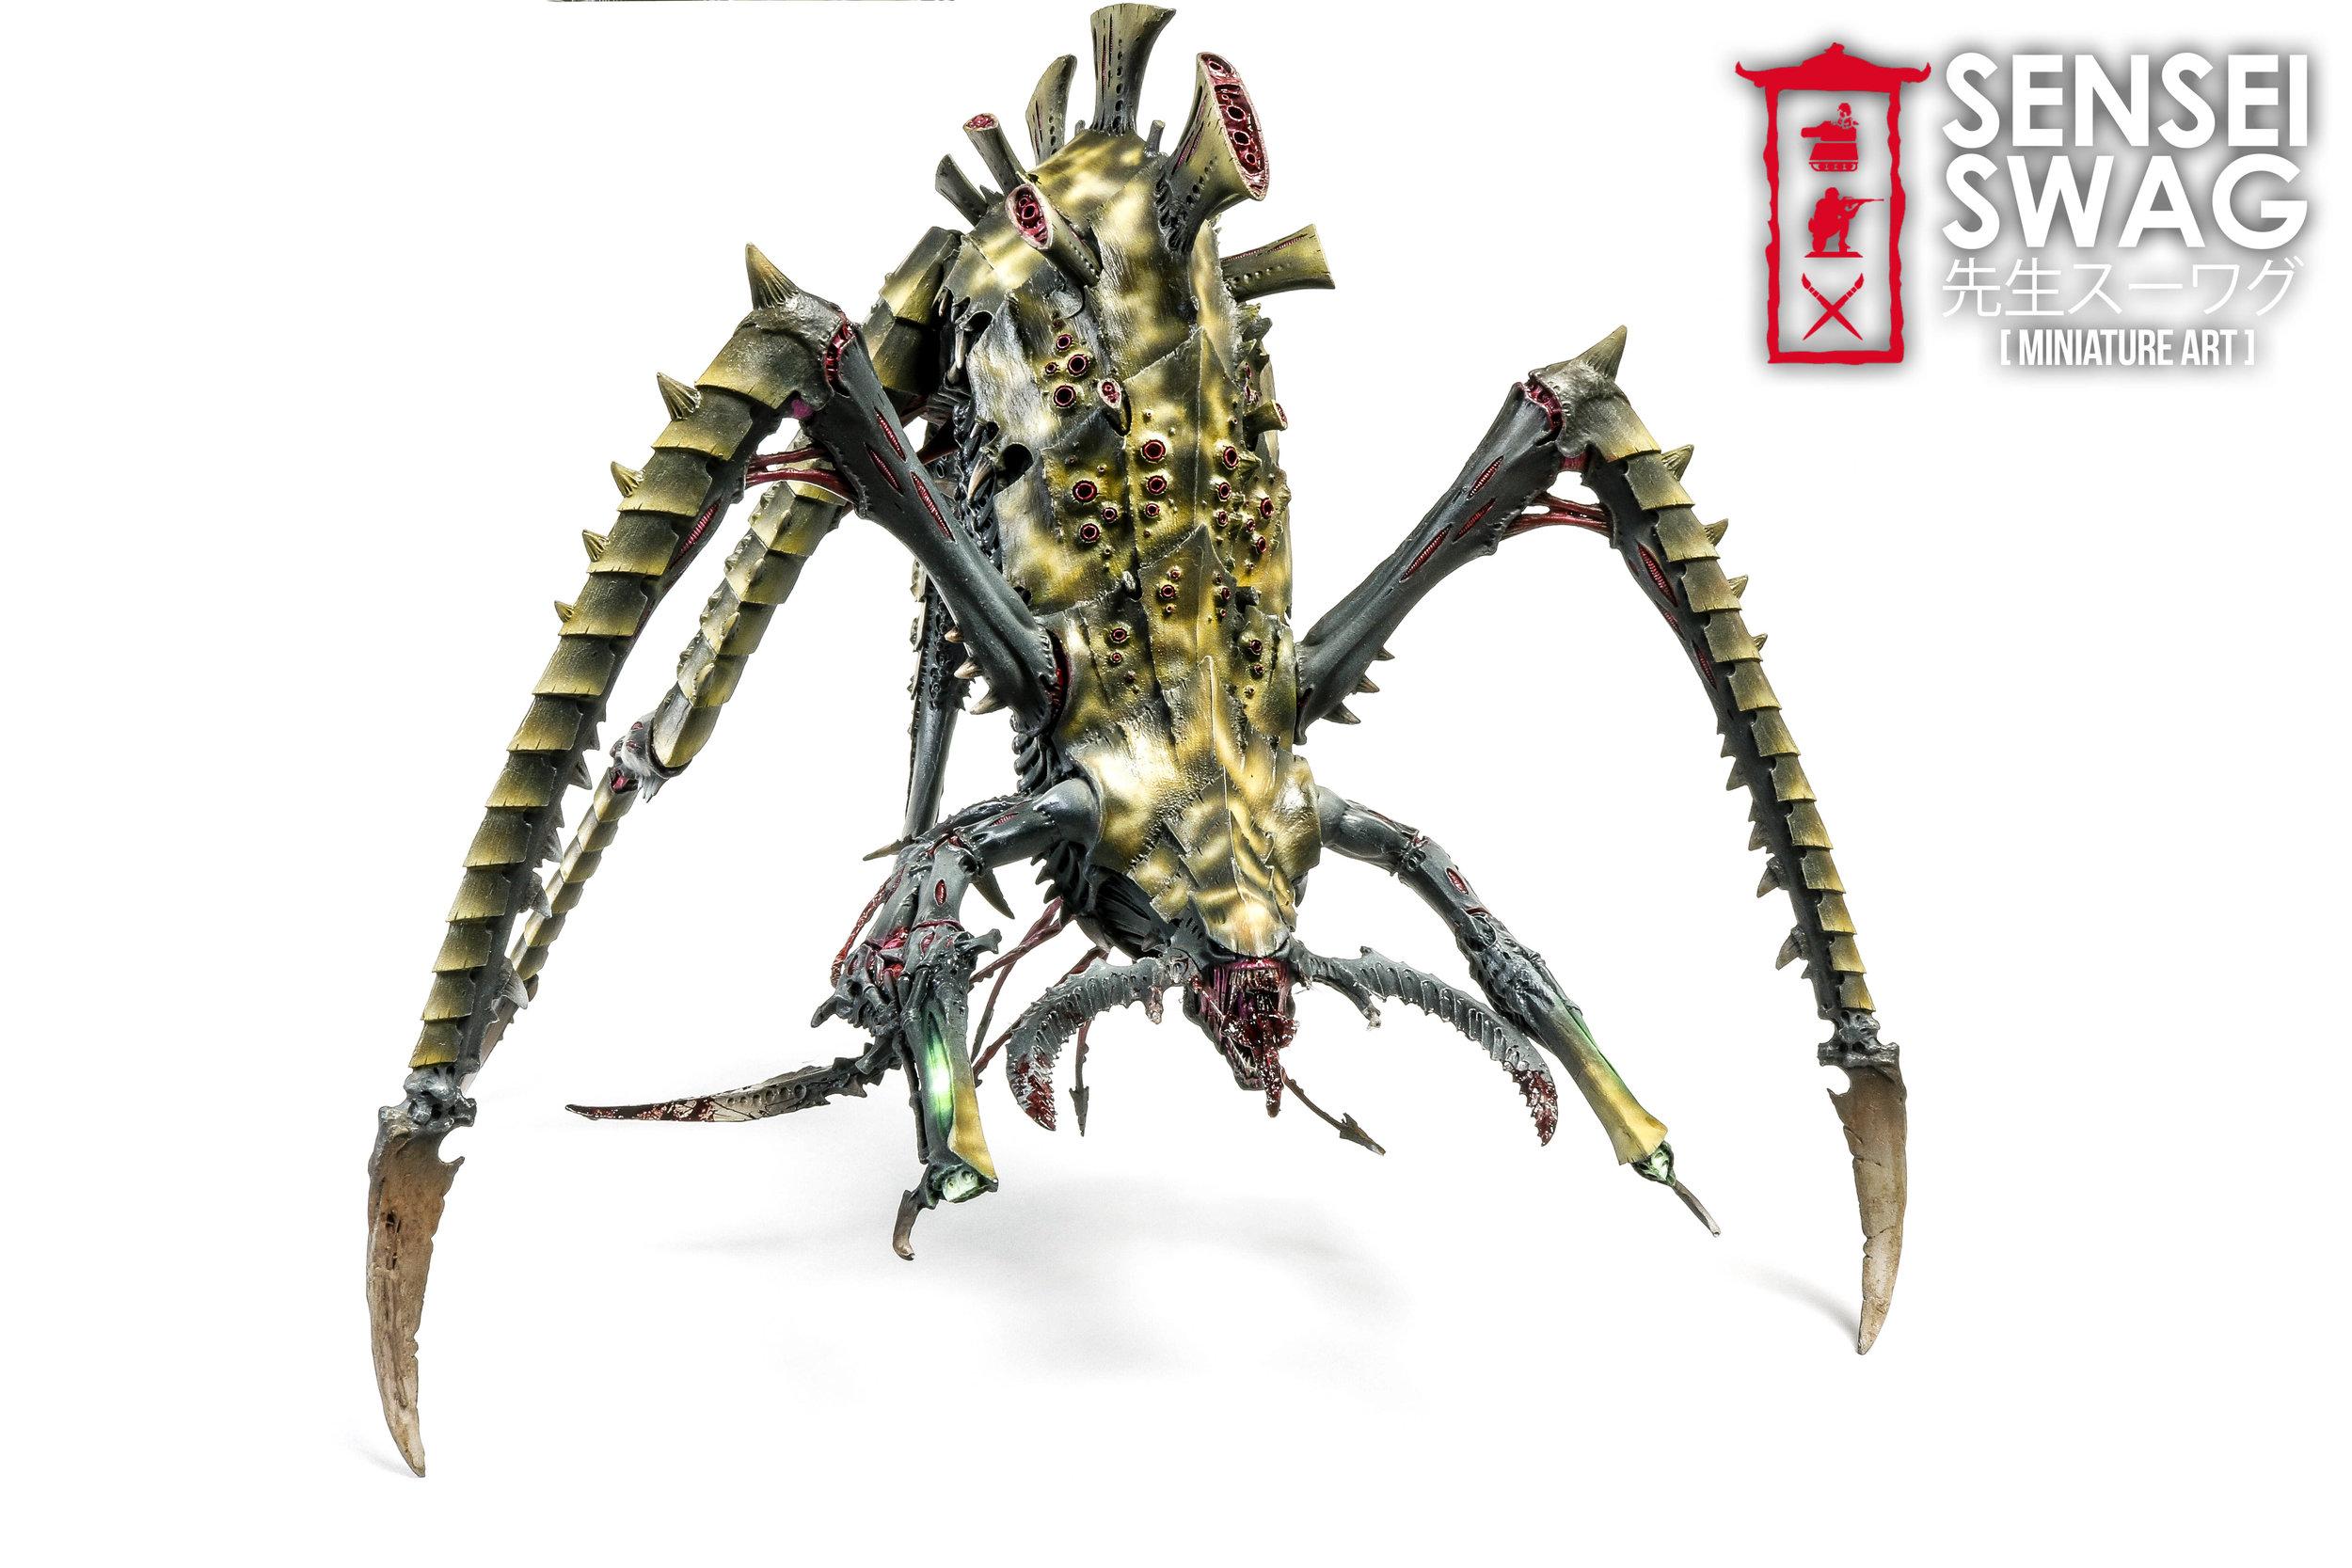 Tyranid Heirophant Hive Fleet Jormungandr-1.jpg